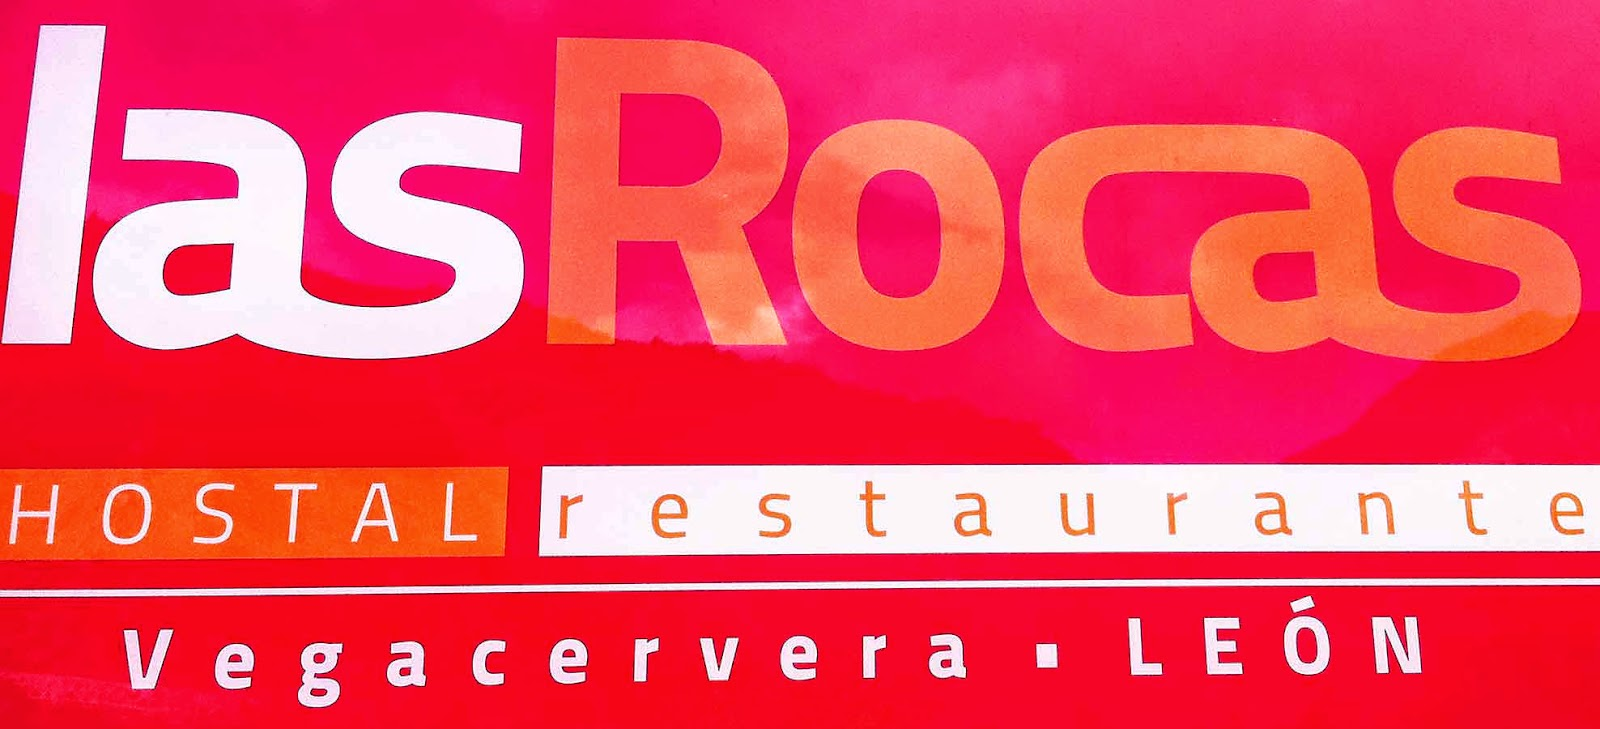 Restaurante-LasRocas-Vegacervera-Leon-Logo